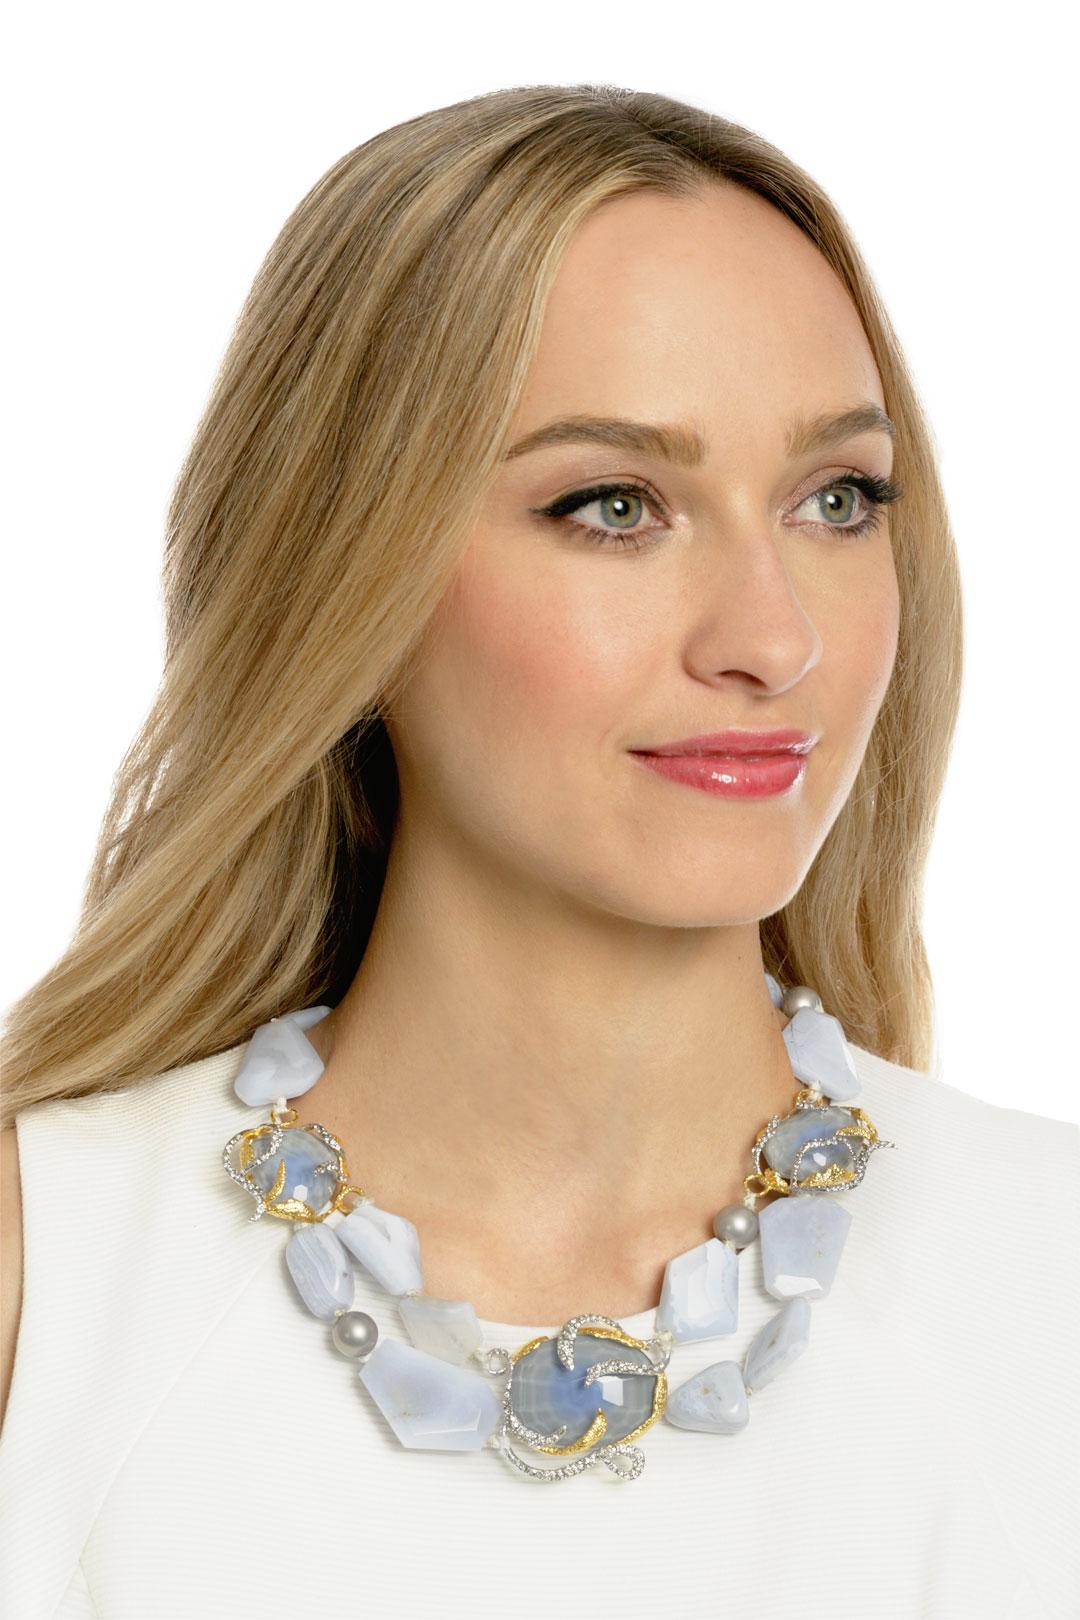 jewelry_necklace_alexis_bittar_azure_vine_over_0.jpg